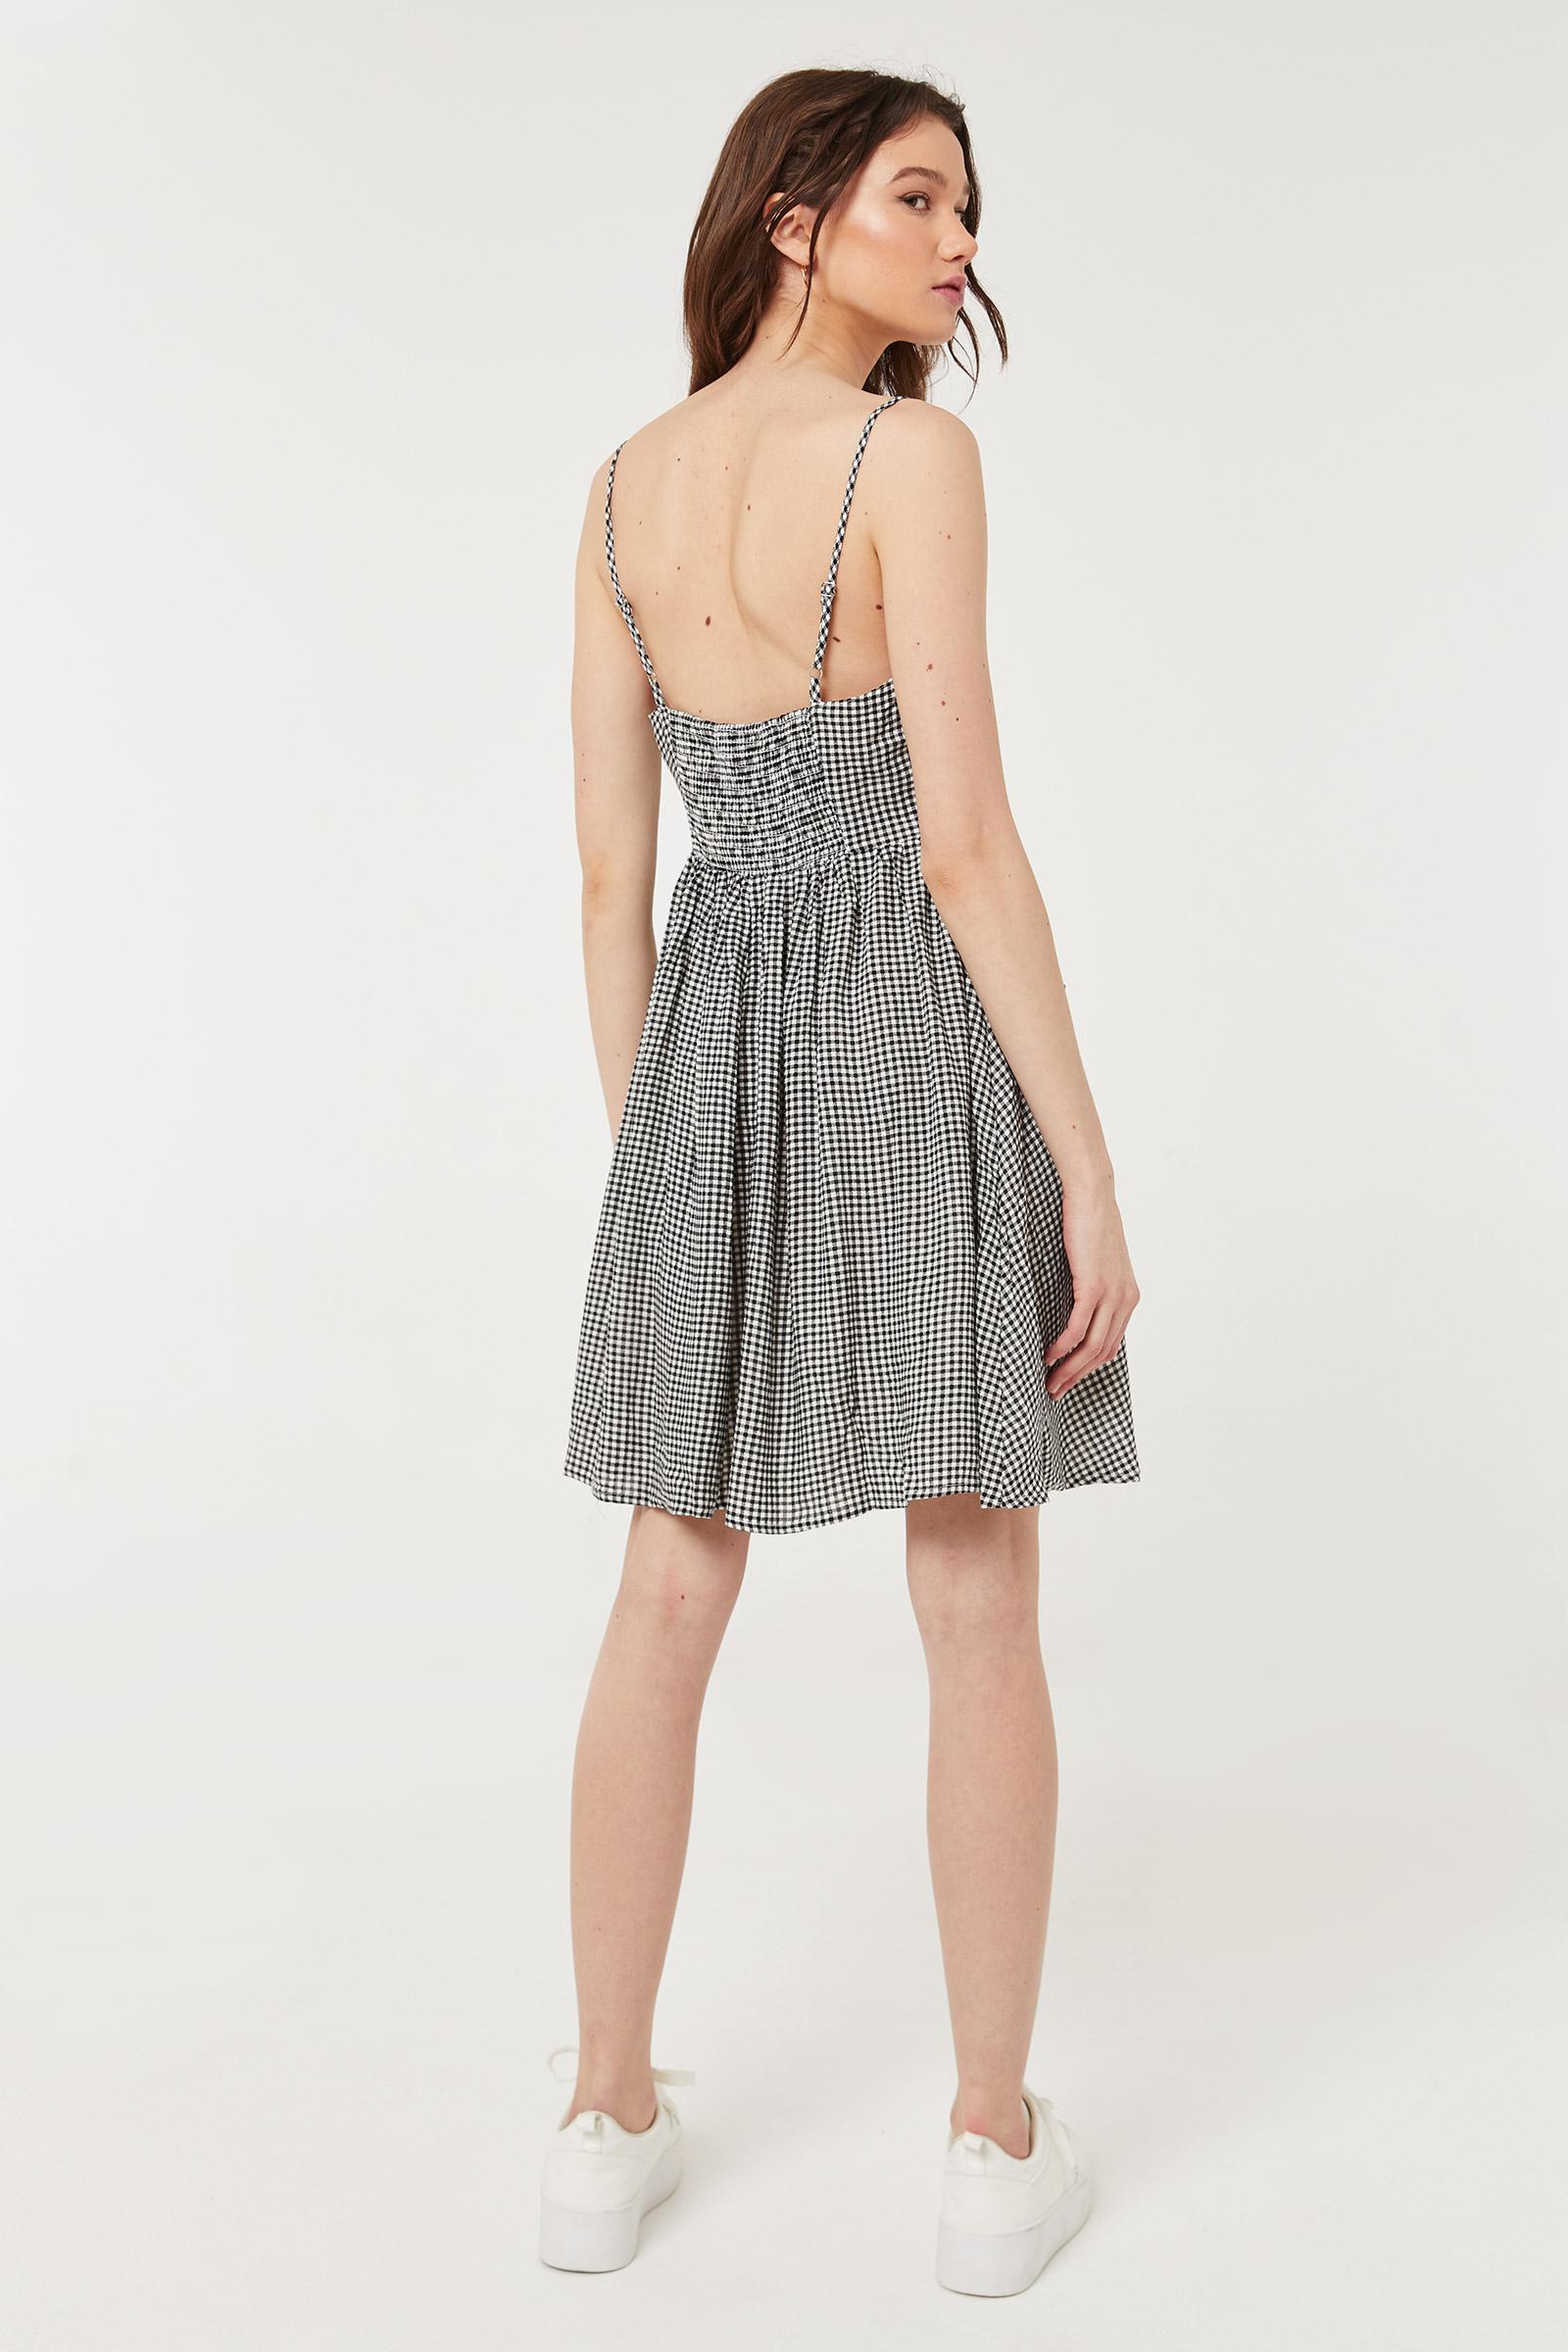 Gingham Sweetheart Laced Mini Dress